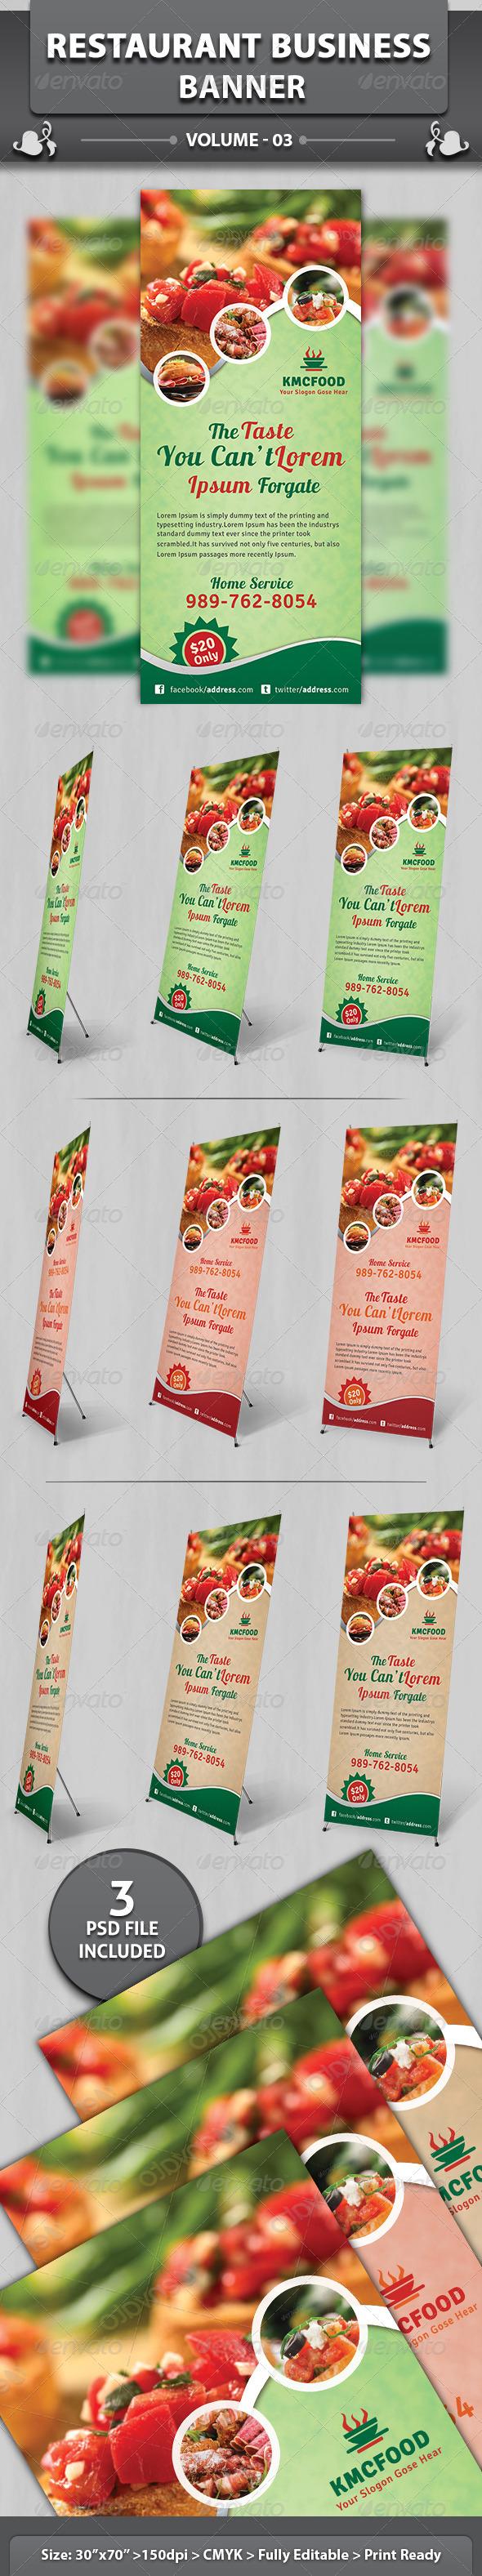 Restaurant Business Banner | Volume 3 - Signage Print Templates